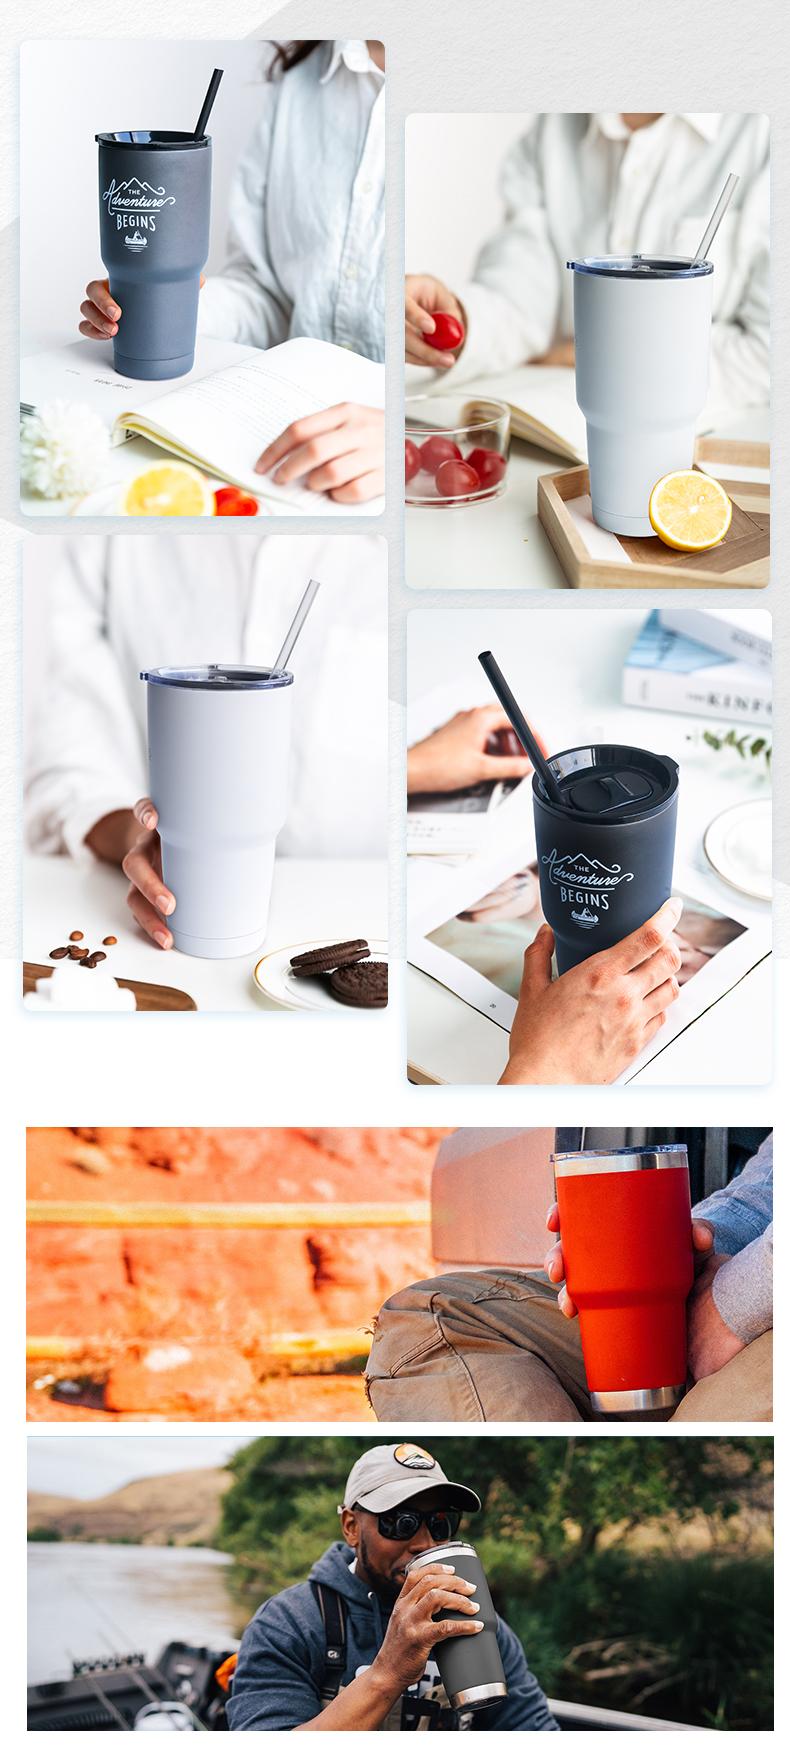 THERMOS กาแฟถ้วยแก้วที่กำหนดเองโลโก้เปล่าแก้วระเหิด THERMOS